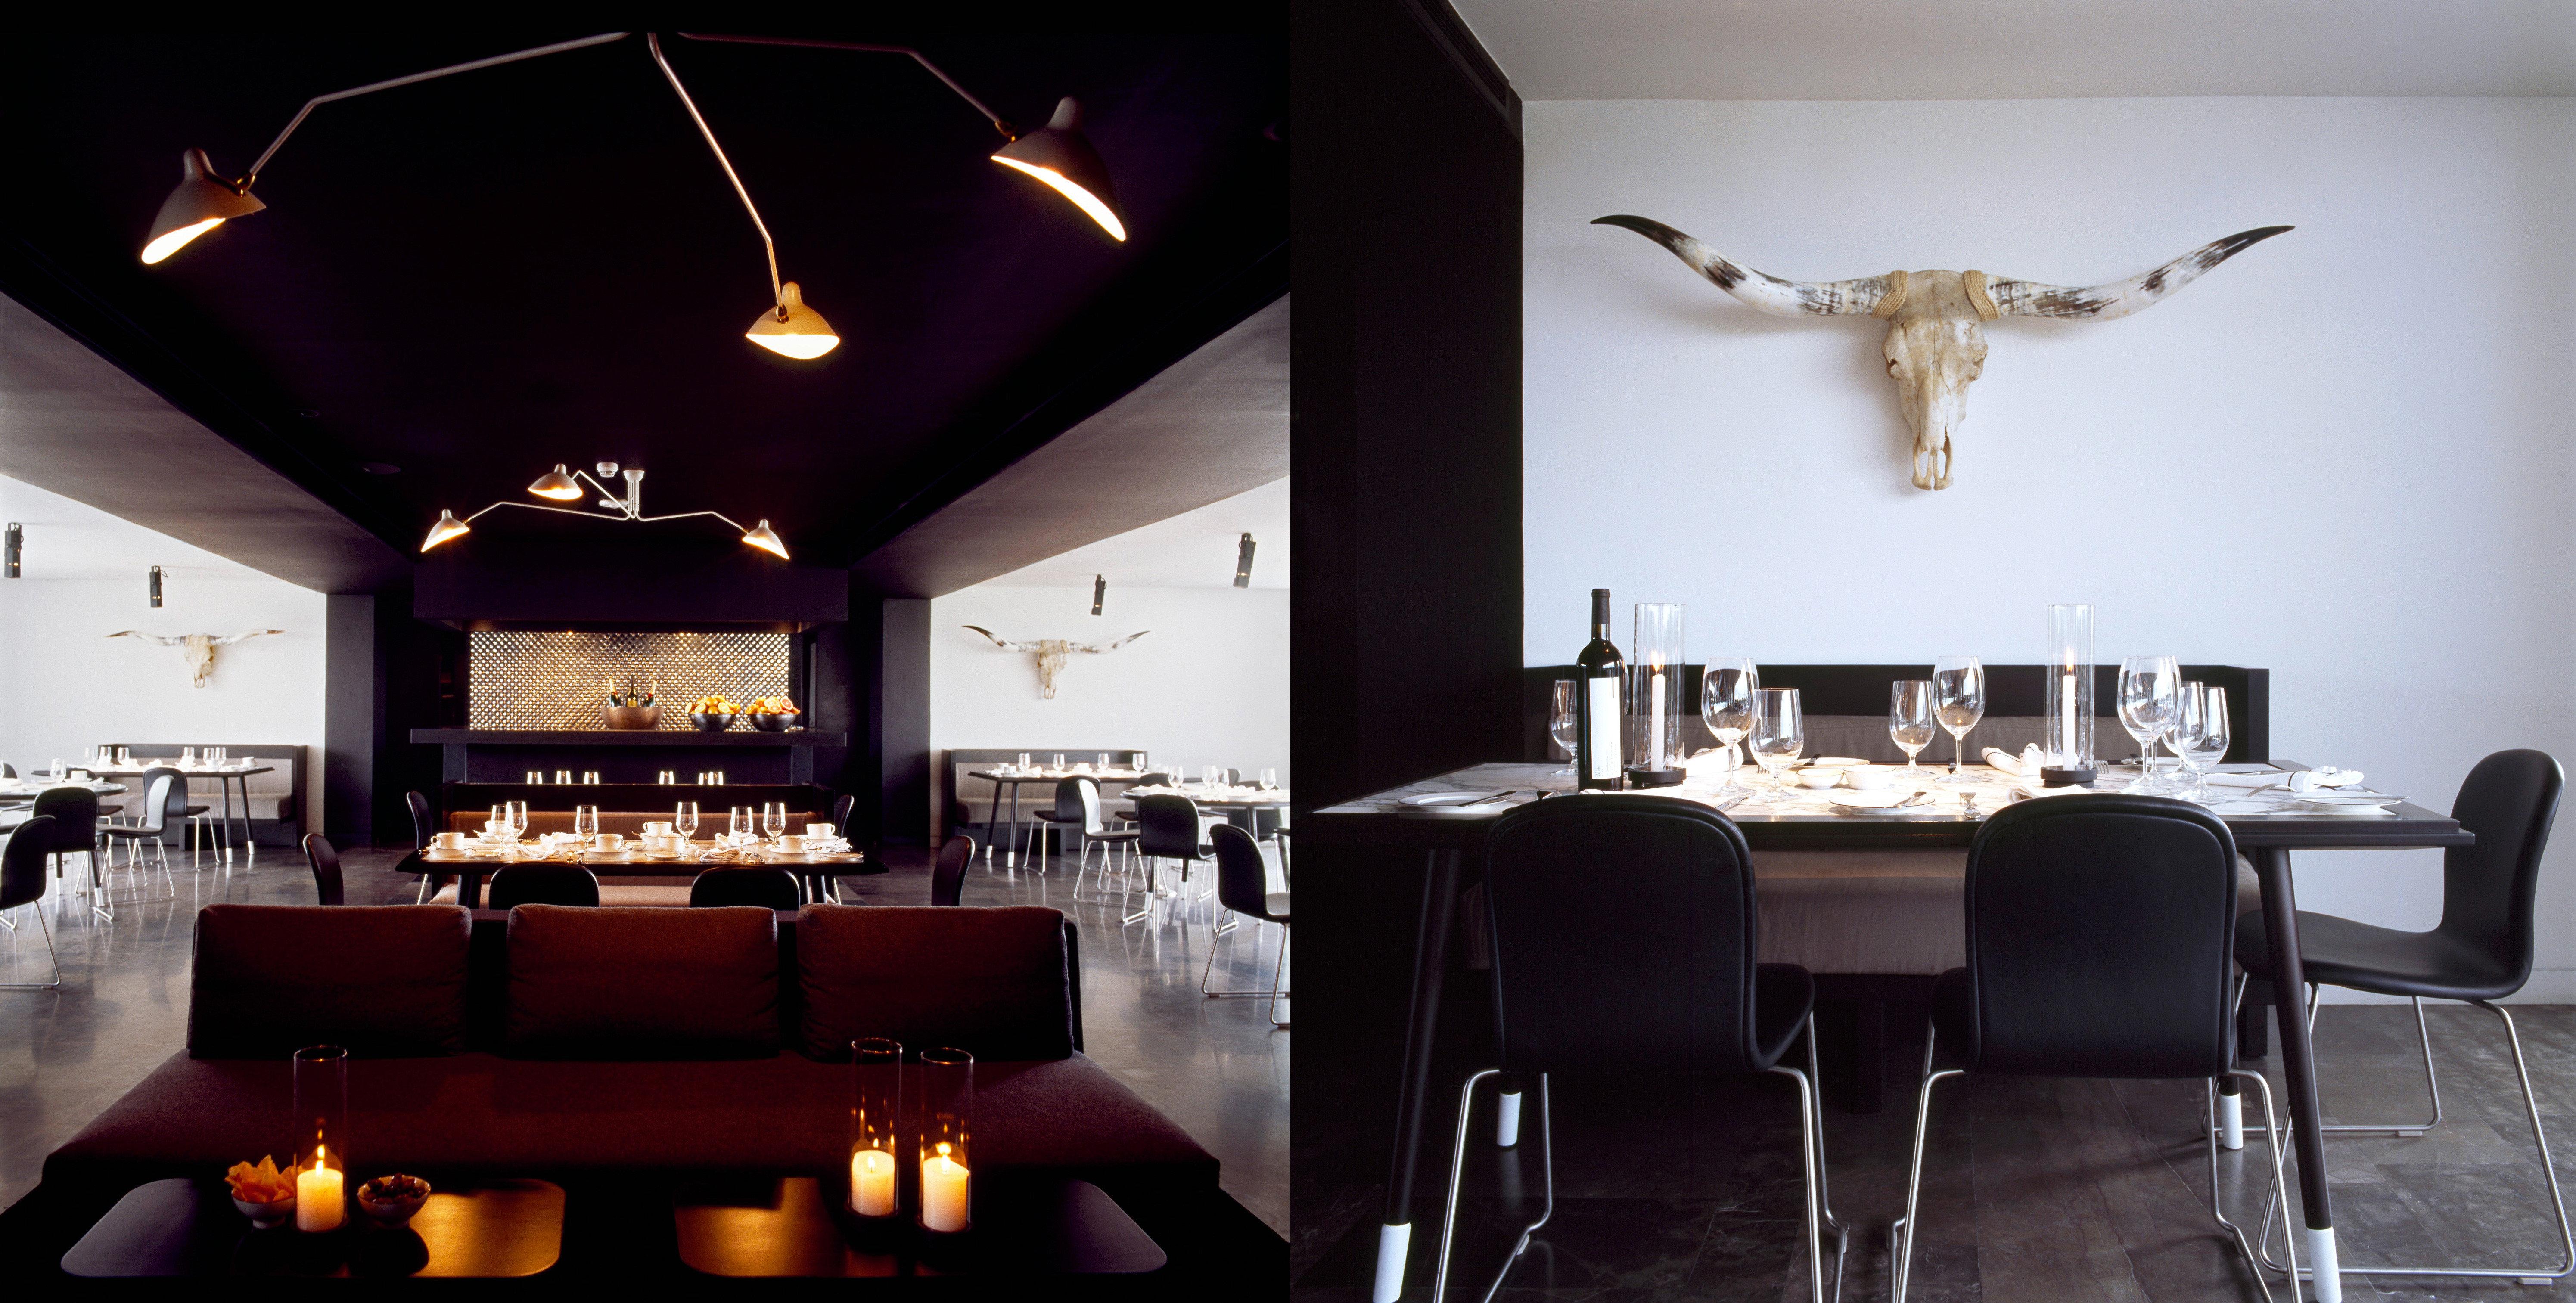 restaurant lighting Bar function hall